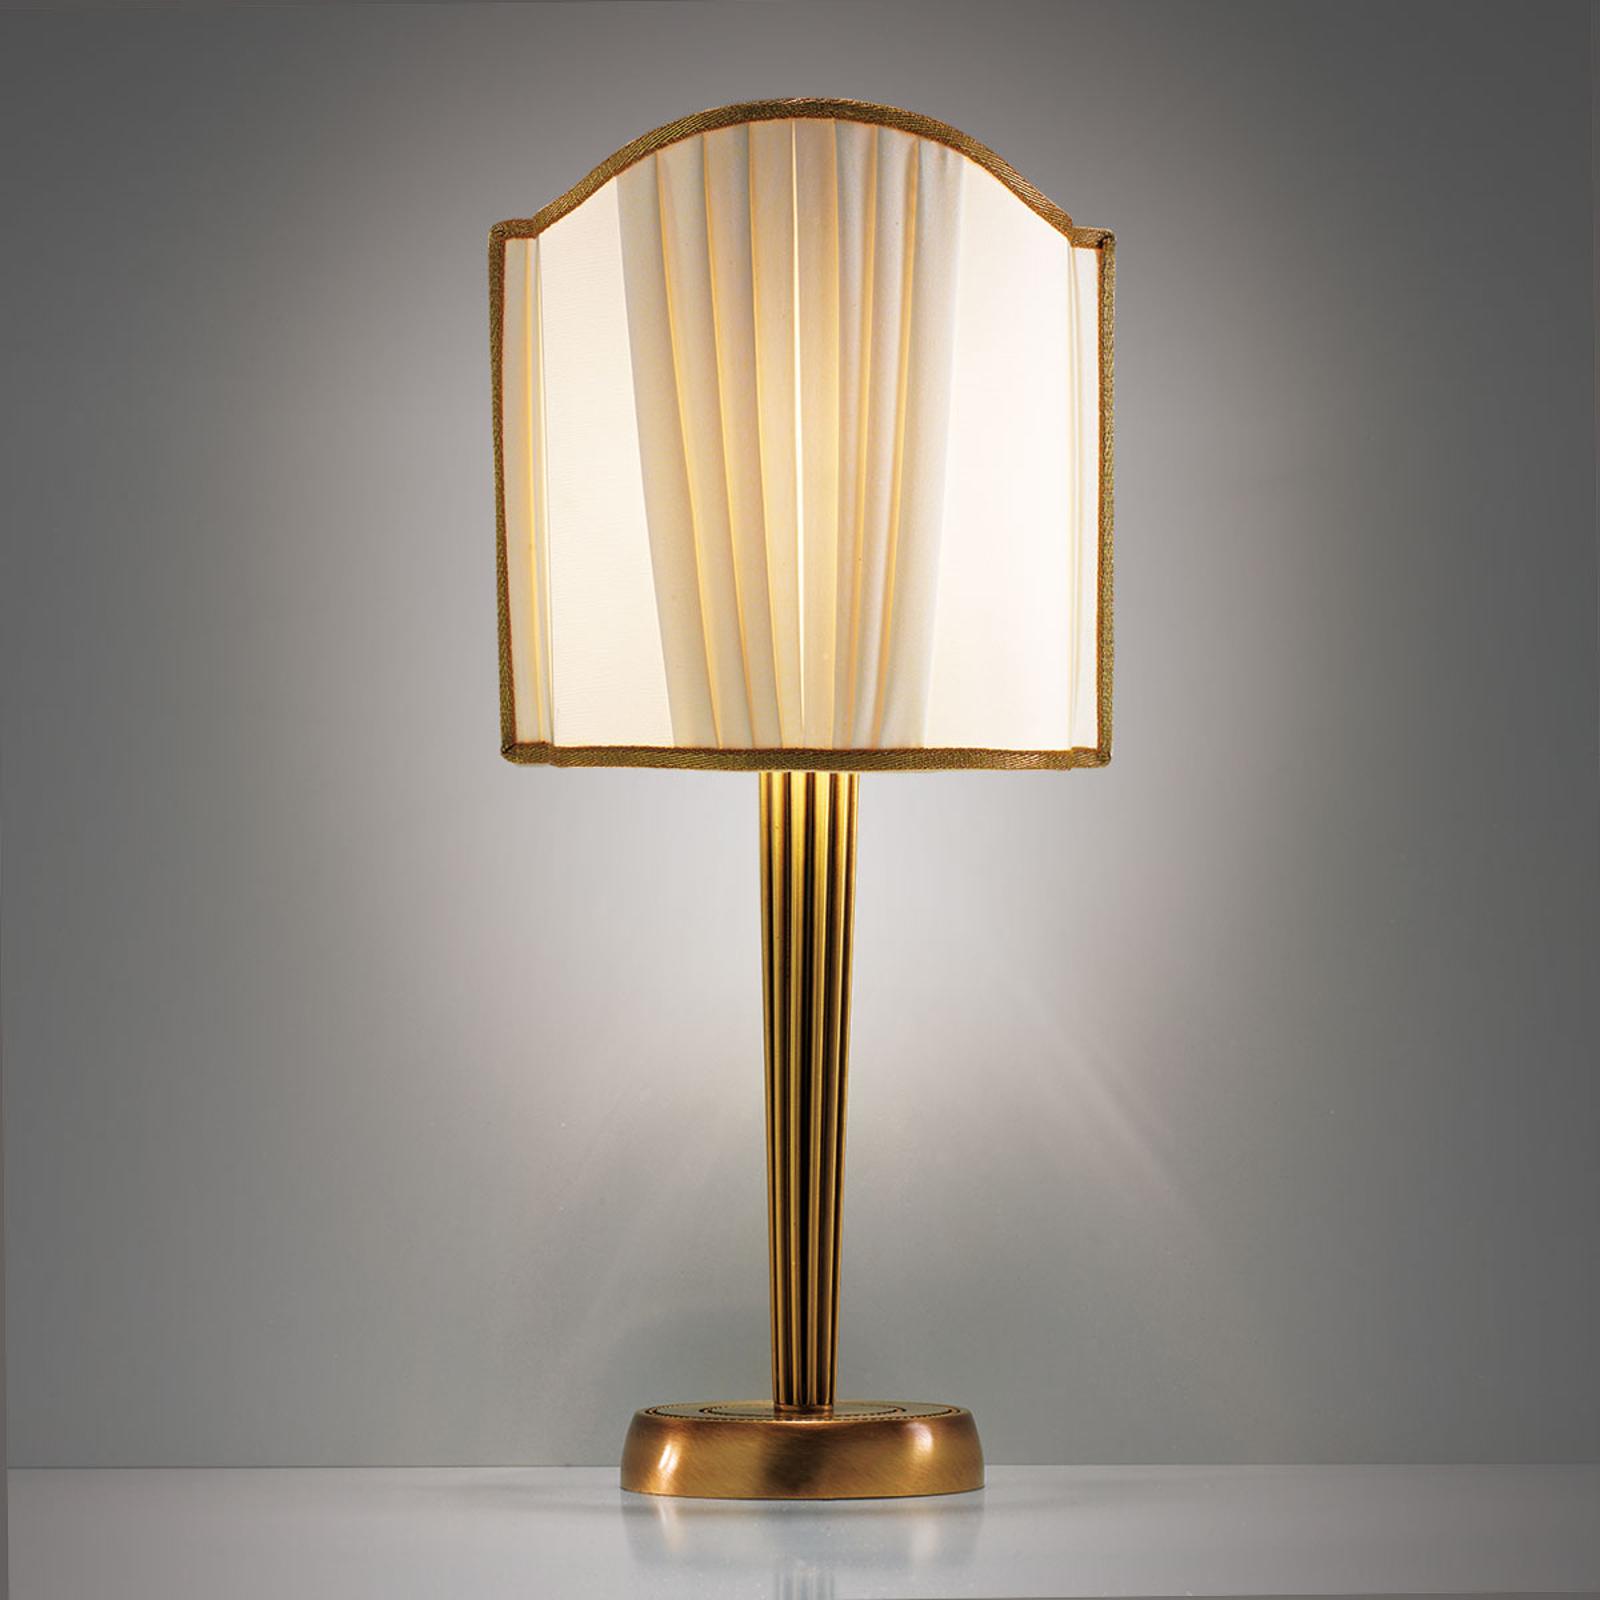 Lámpara de mesa Belle Epoque de 20 cm de altura